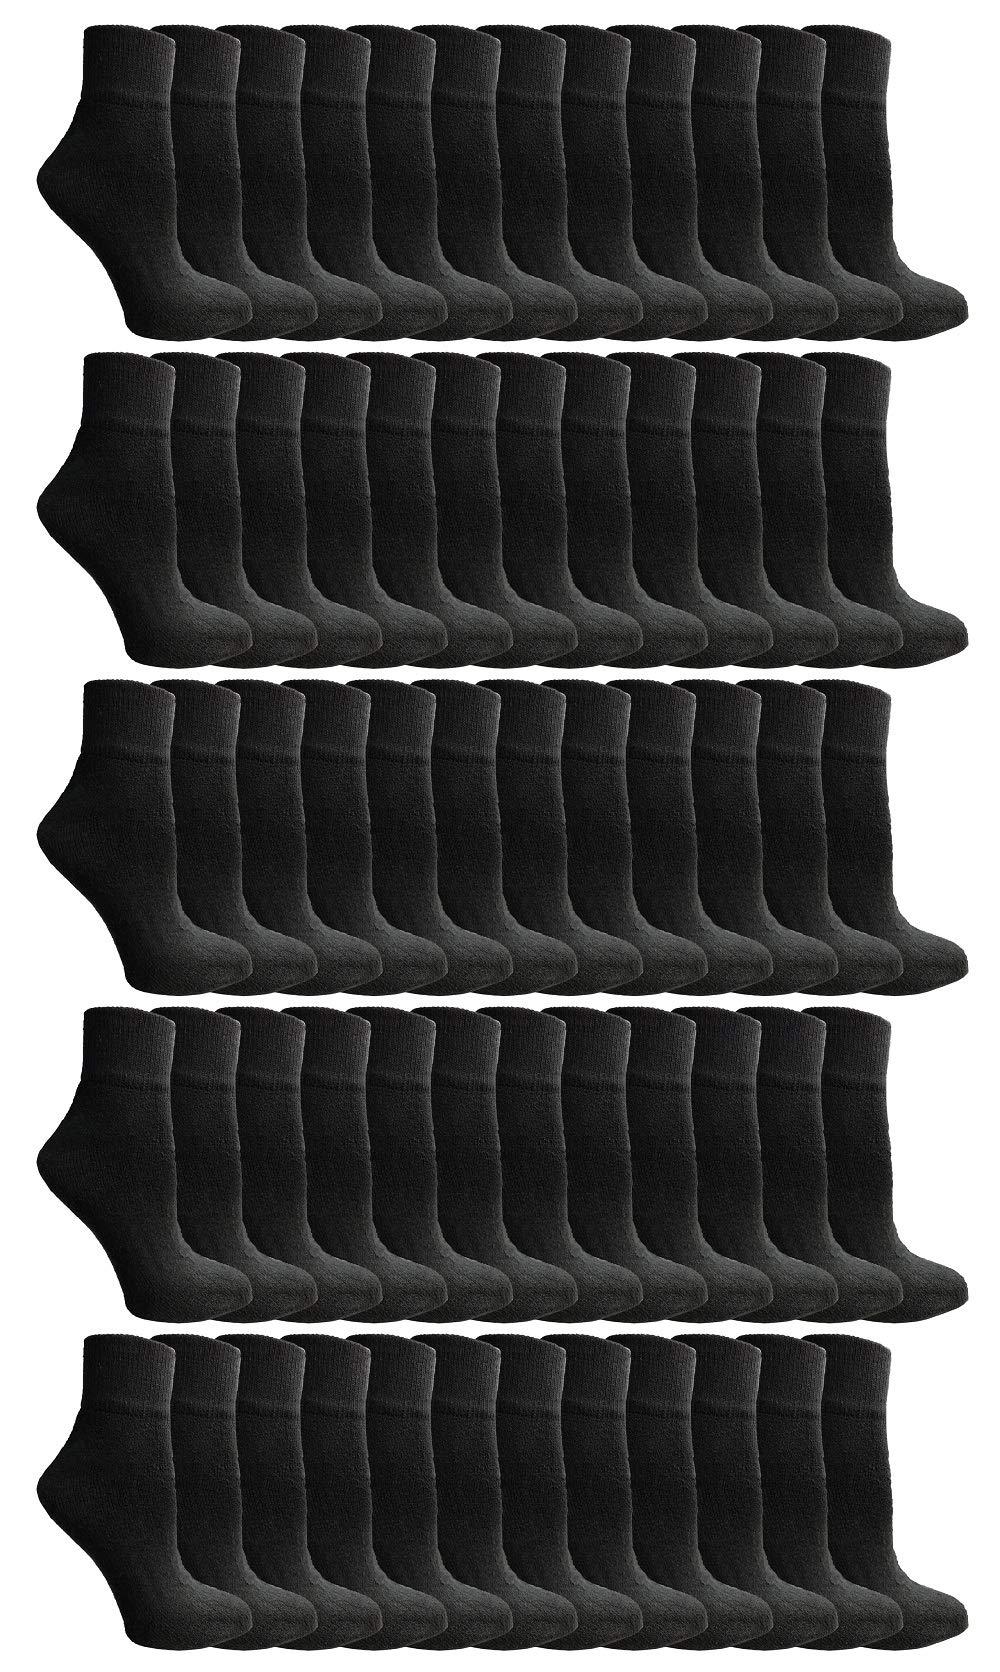 Yacht & Smith Kids Ankle Wholesale Bulk Pack Athletic Sports Socks, by SOCKS'NBULK (Kids 2-4 (Shoe Size 4-6), 240 Pairs Black)